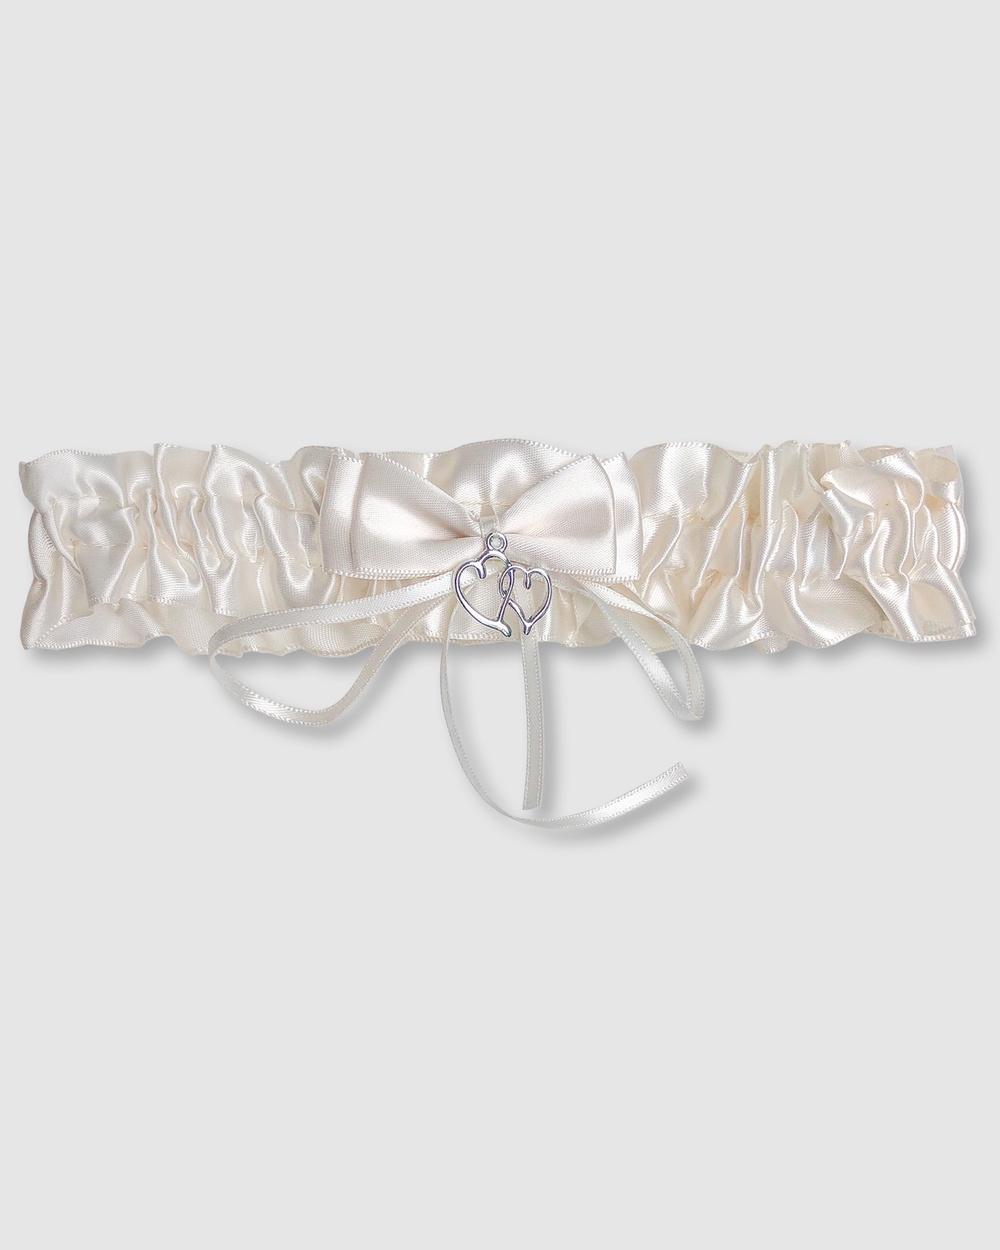 B Free Intimate Apparel Bridal Garter Deluxe Wedding & Ivory